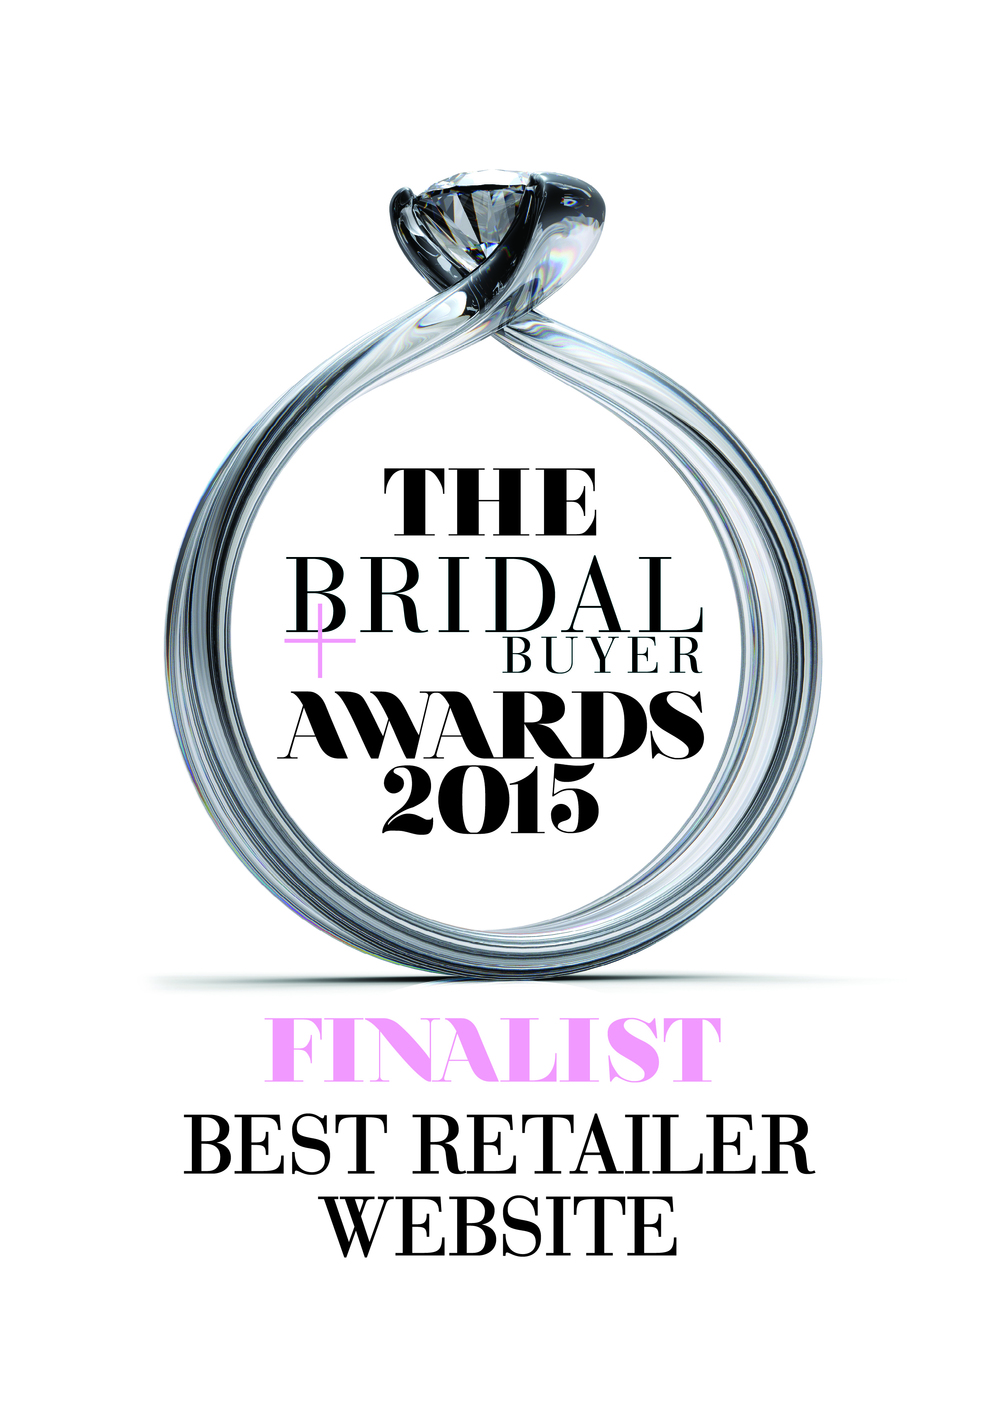 Bridal Buyer Awards 2015